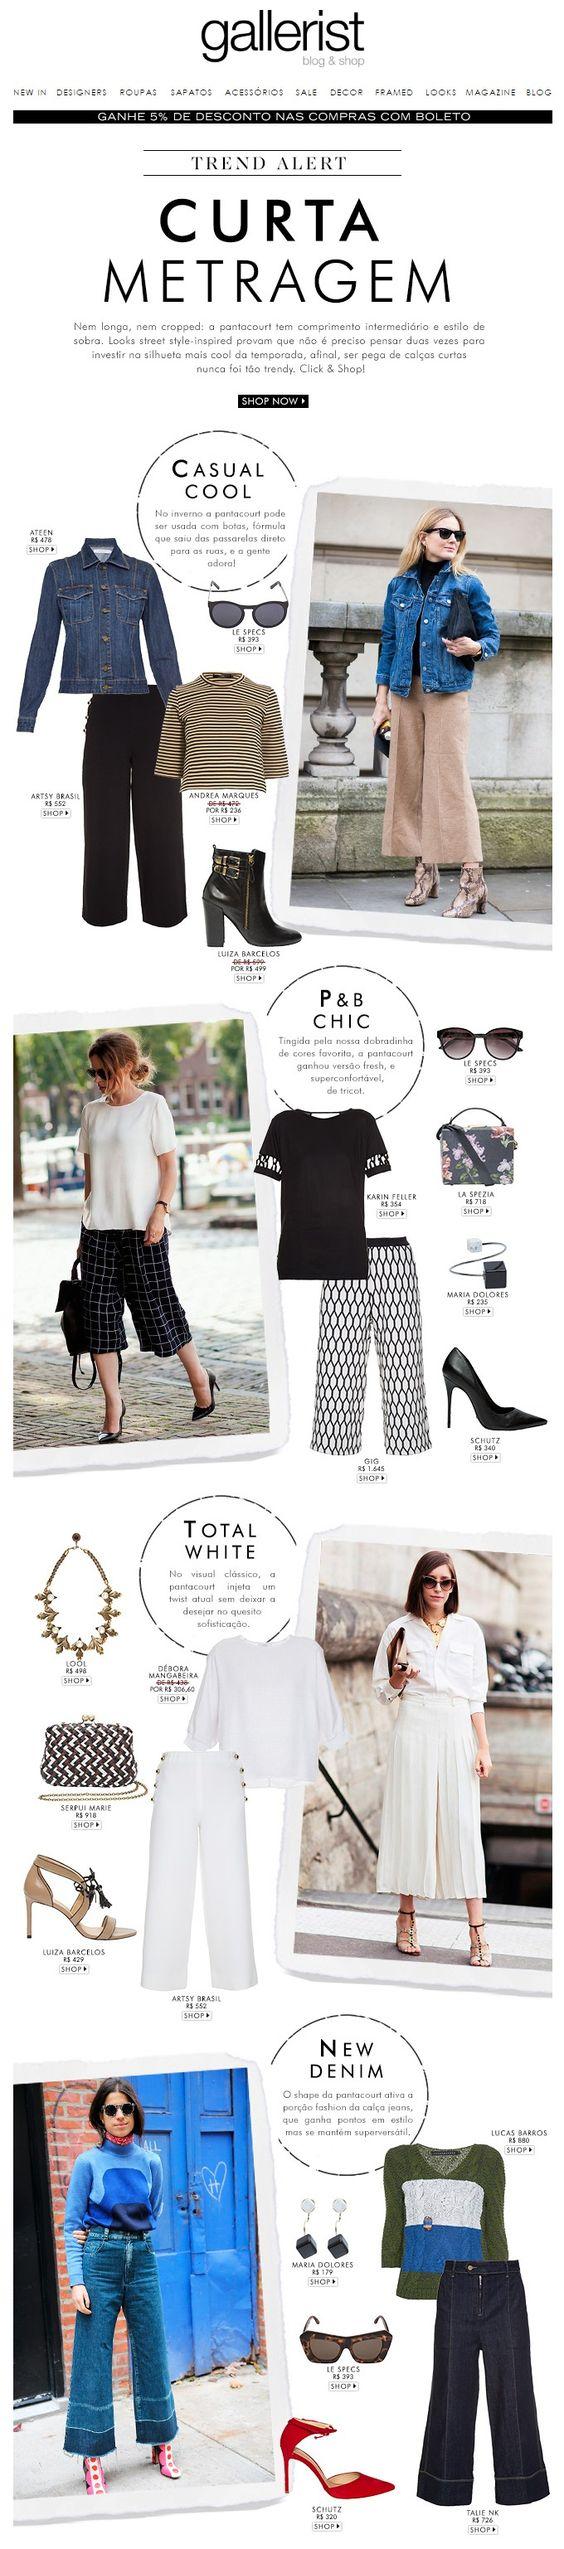 layout, newsletter, fashion, gallerist, street style, como usar pantacourt,